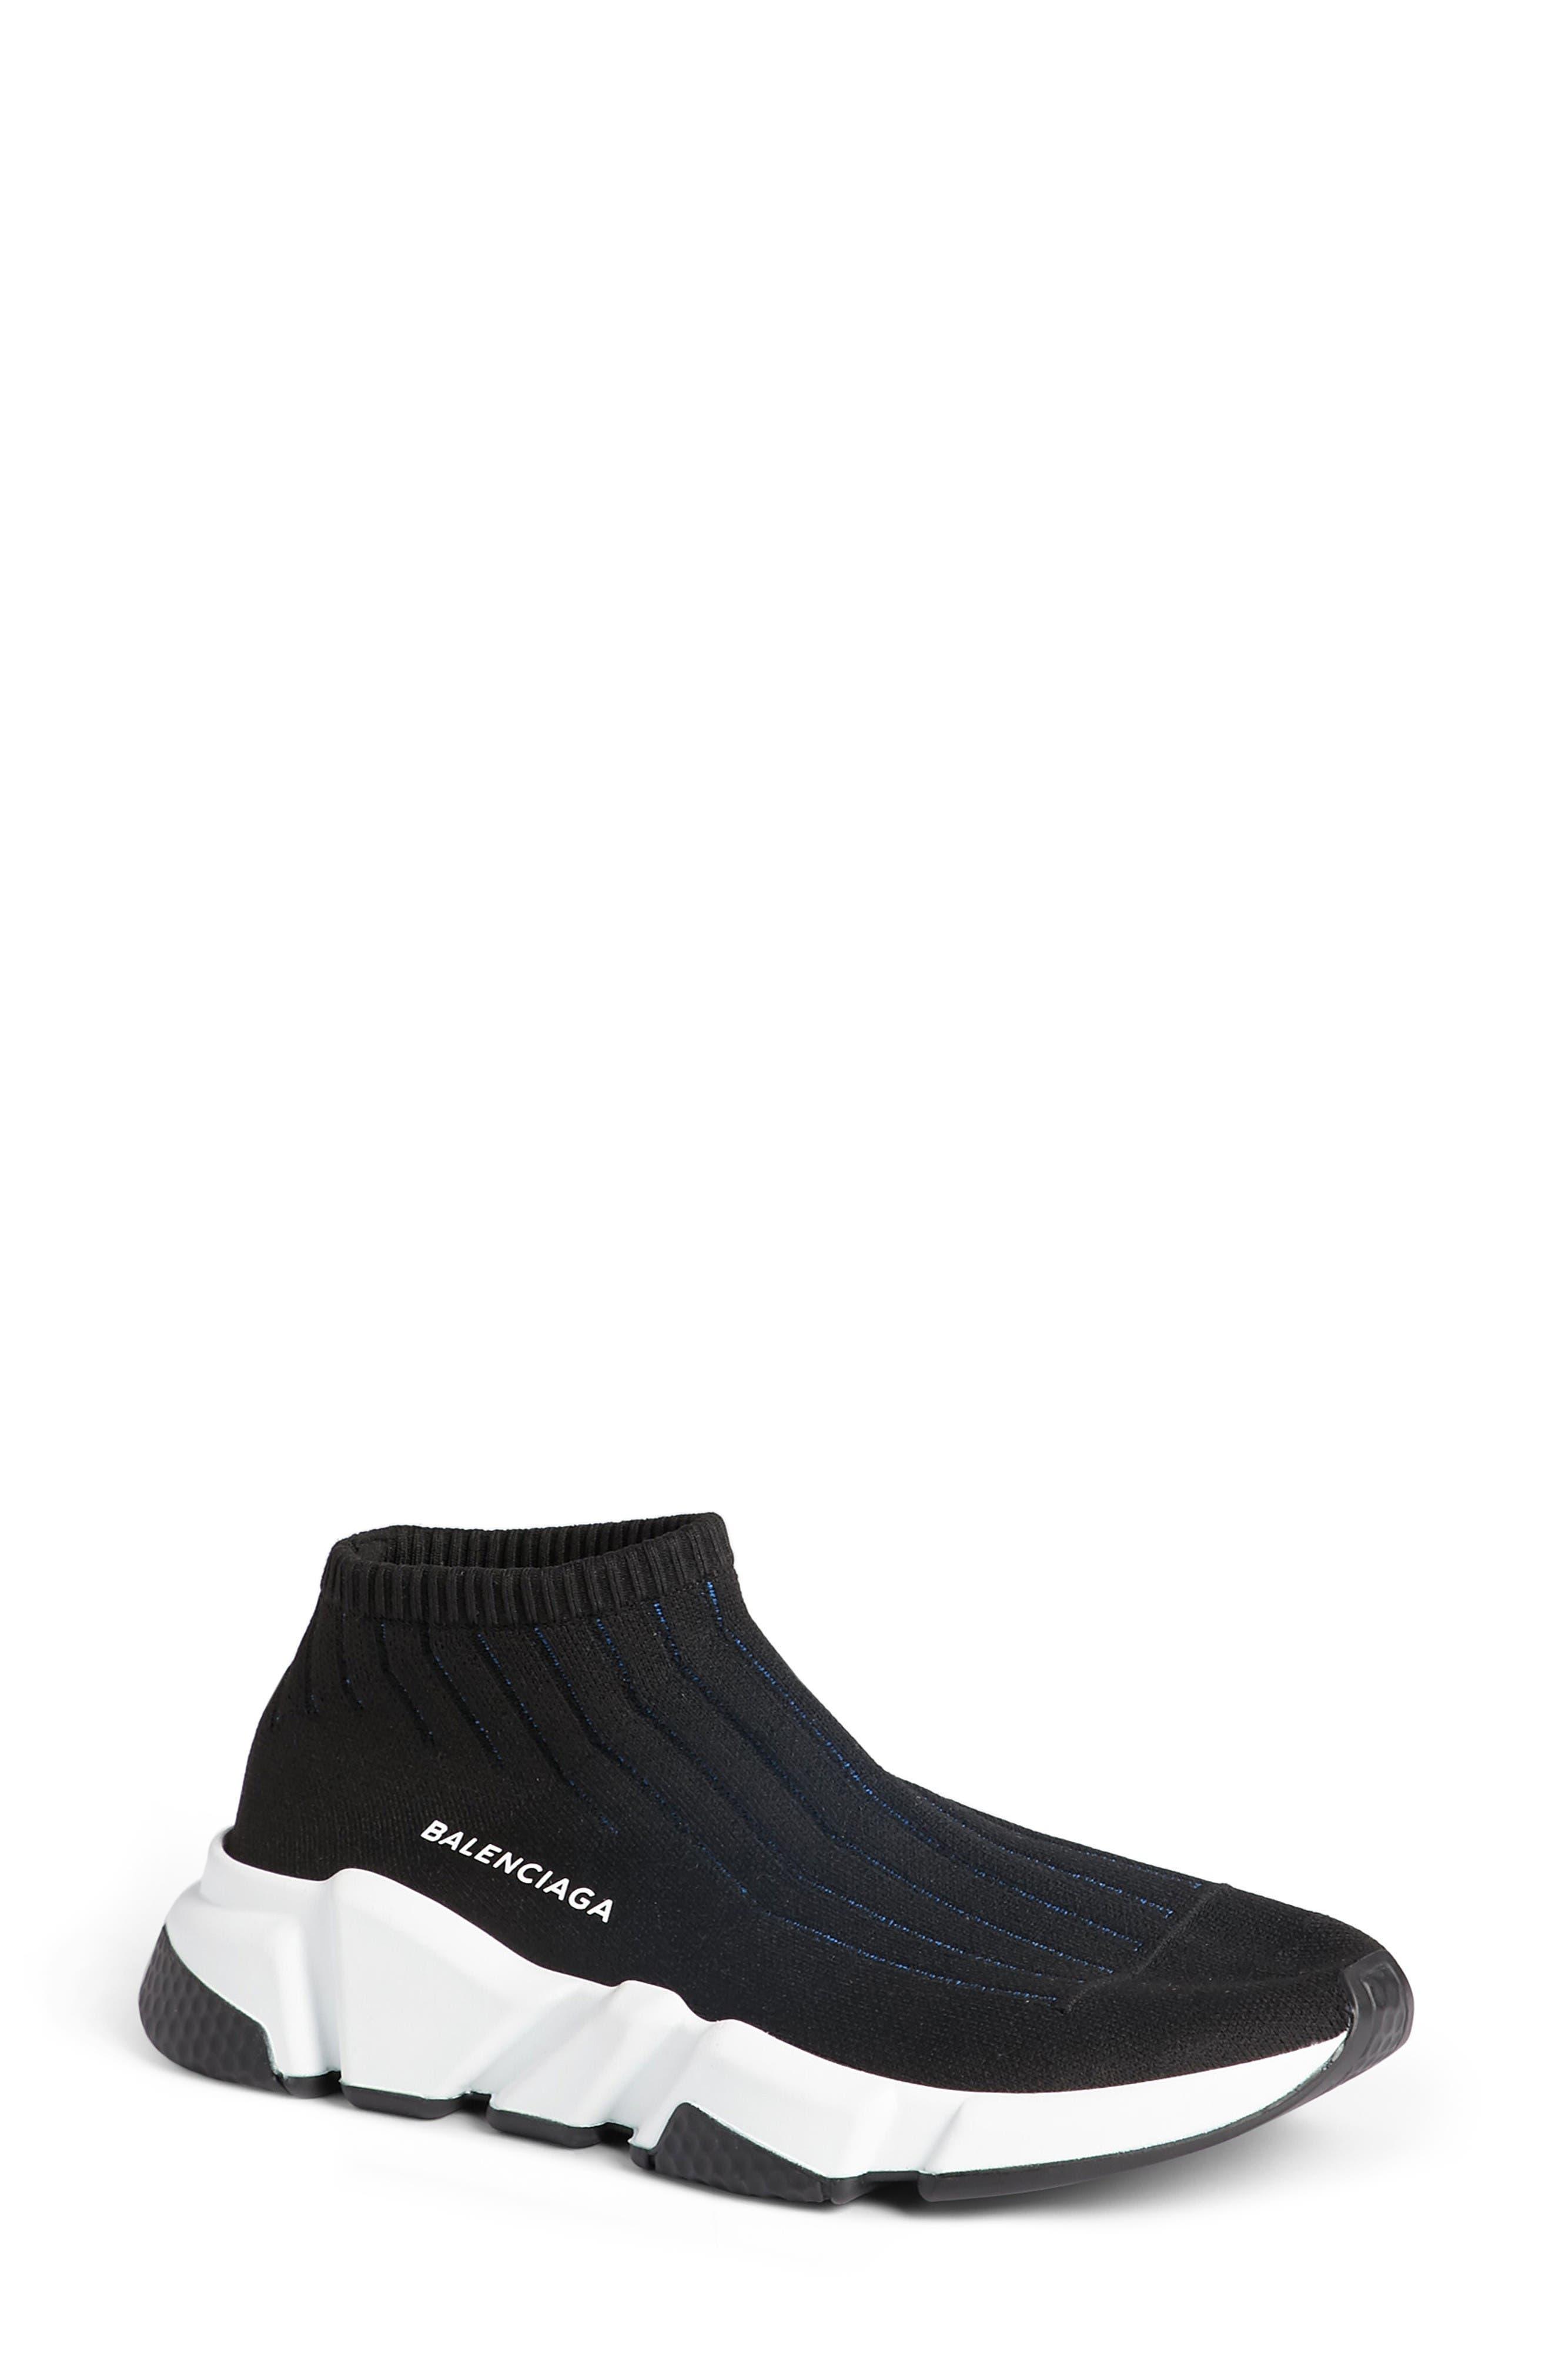 Balenciaga Low Trainer Sneakers (Women)